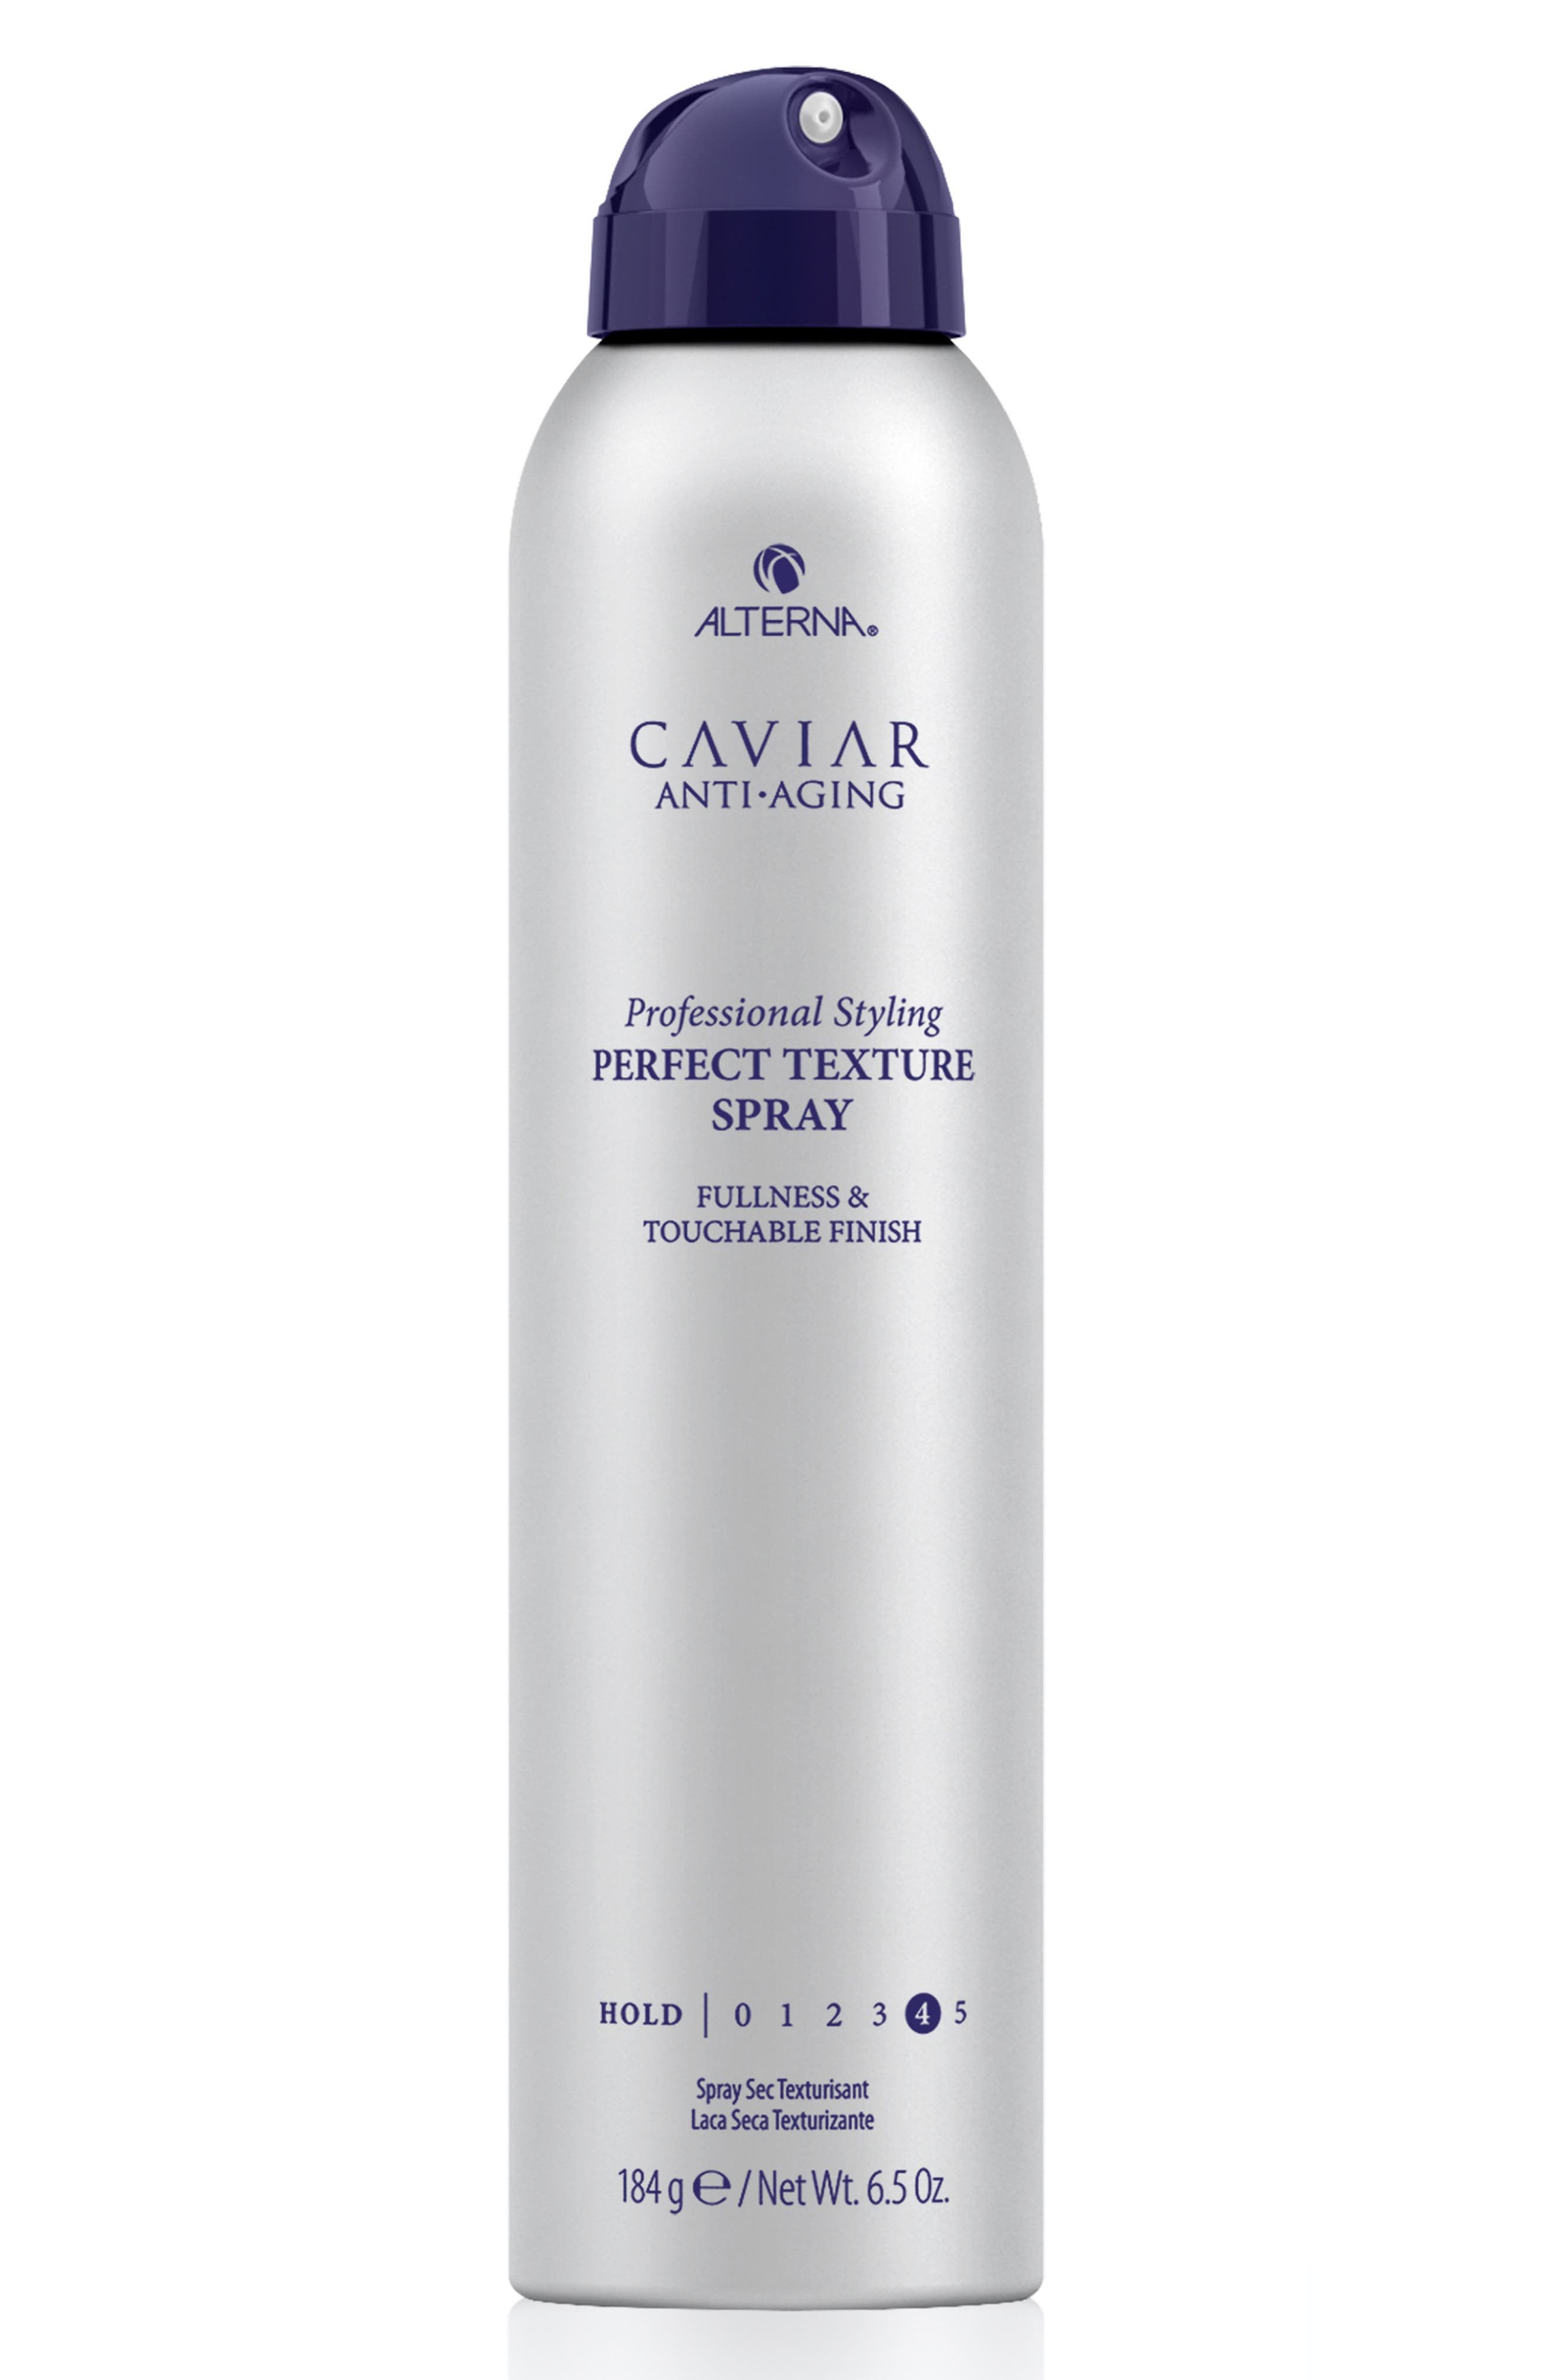 Alterna Caviar Anti-Aging Perfect Texture Finishing Spray